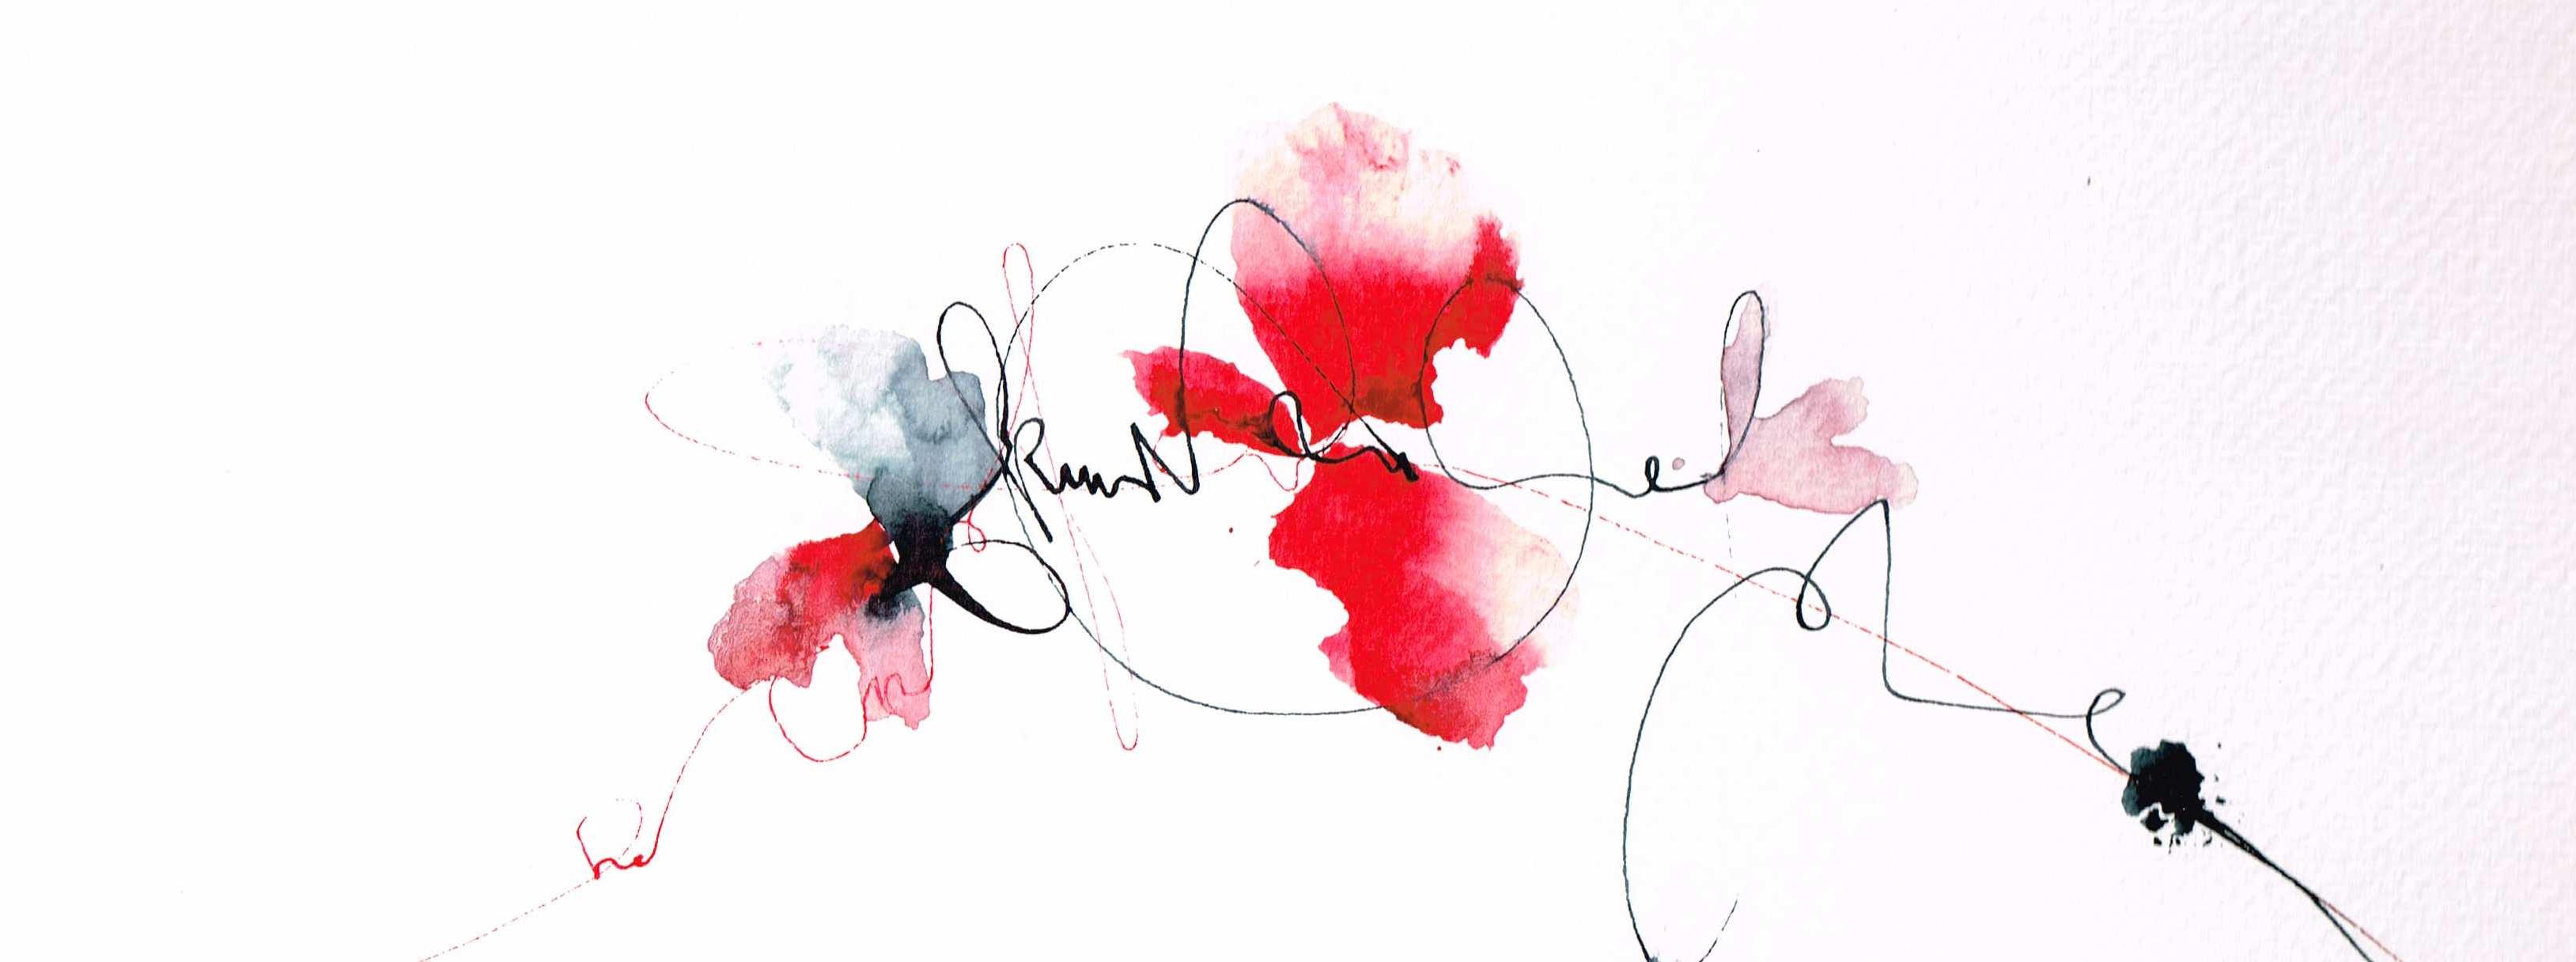 SabinePauwaert-droom2016-wenskaartje